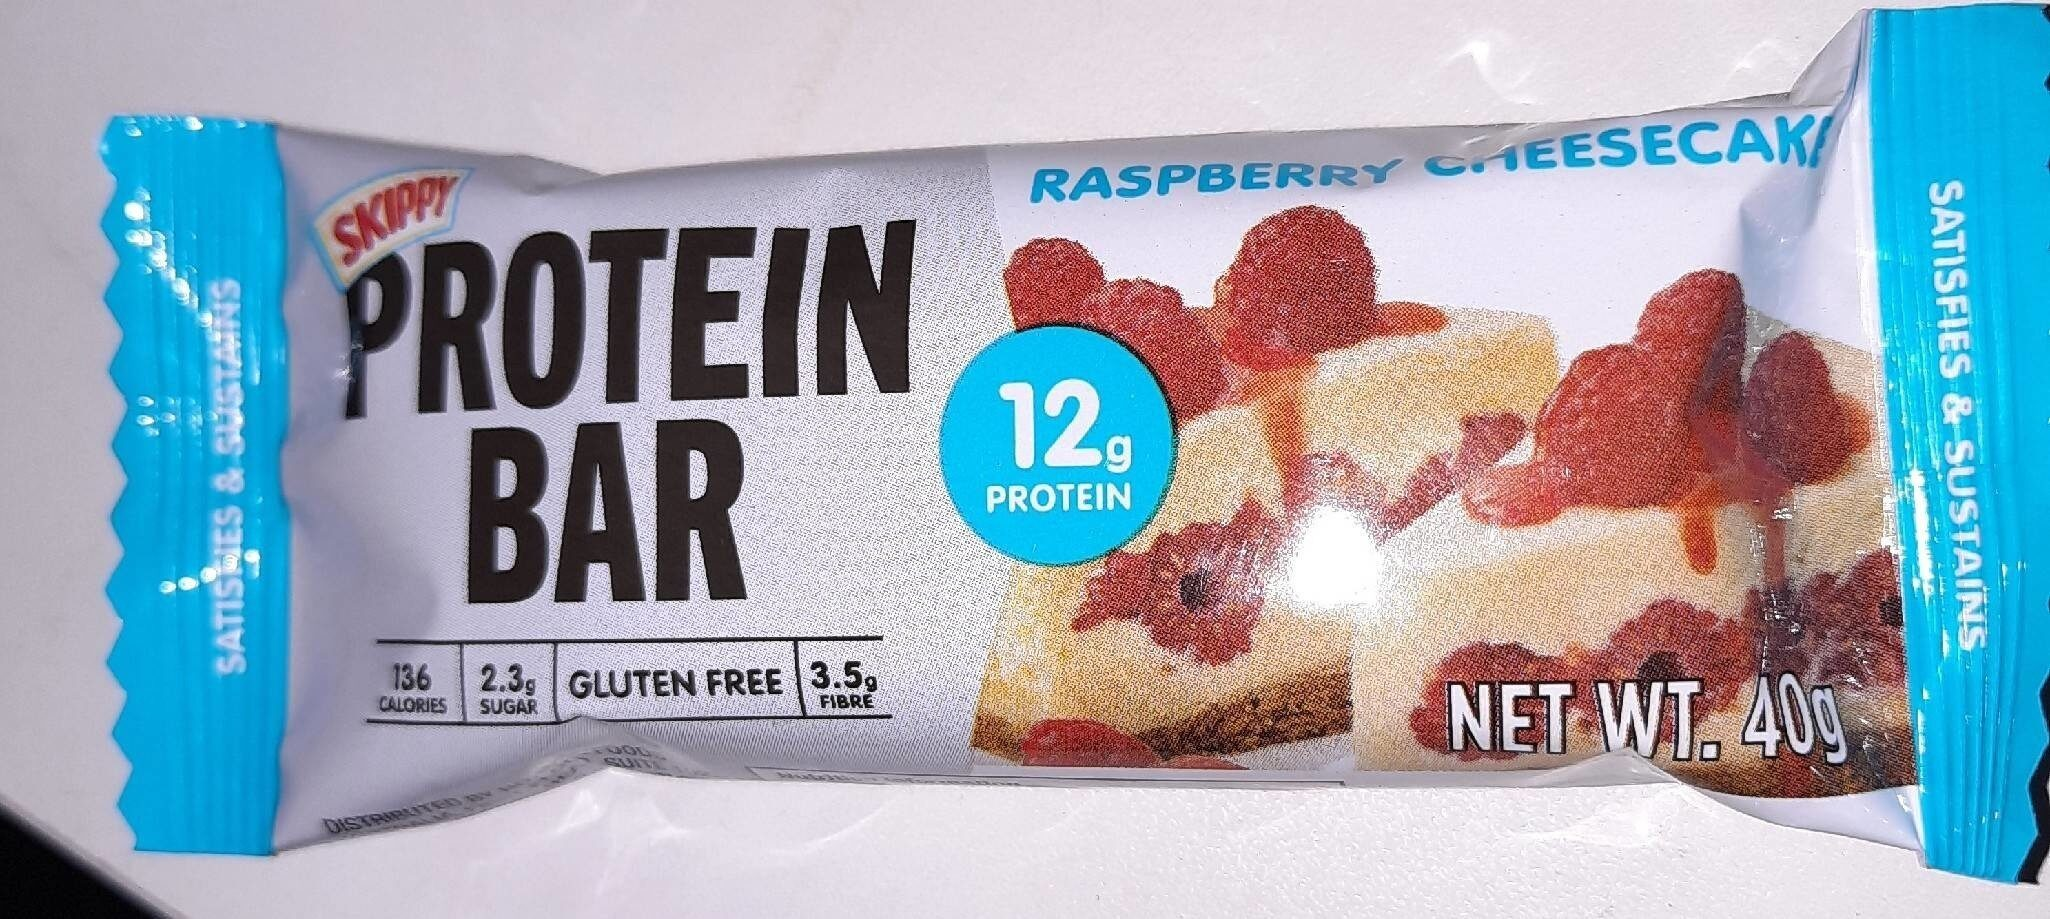 Protein Bar Raspberry Cheesecake - Product - en